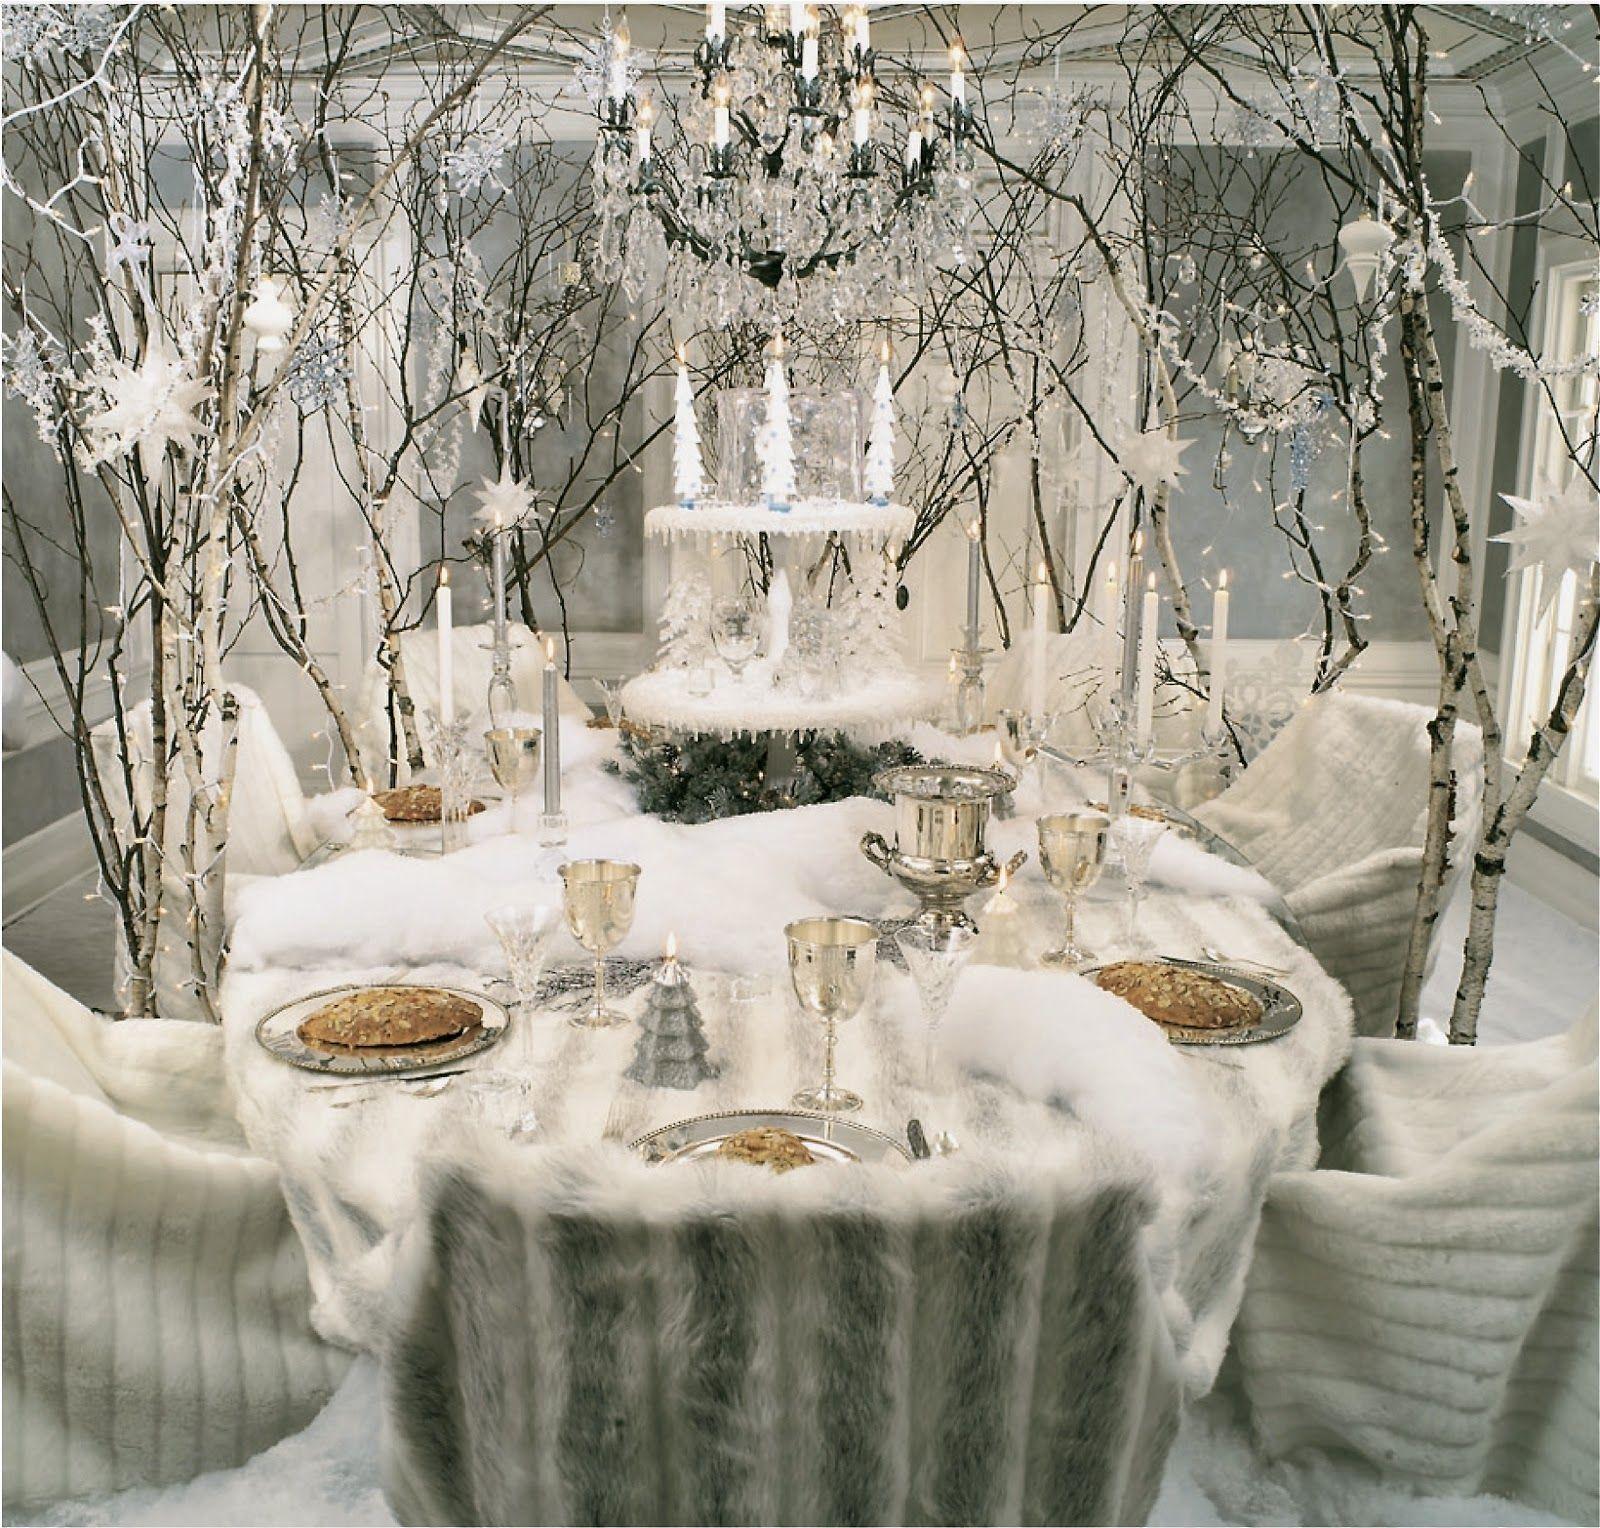 Winter Wonderland Table Life And Linda Winter Wonderland Christmas Christmas Table Christmas Table Settings